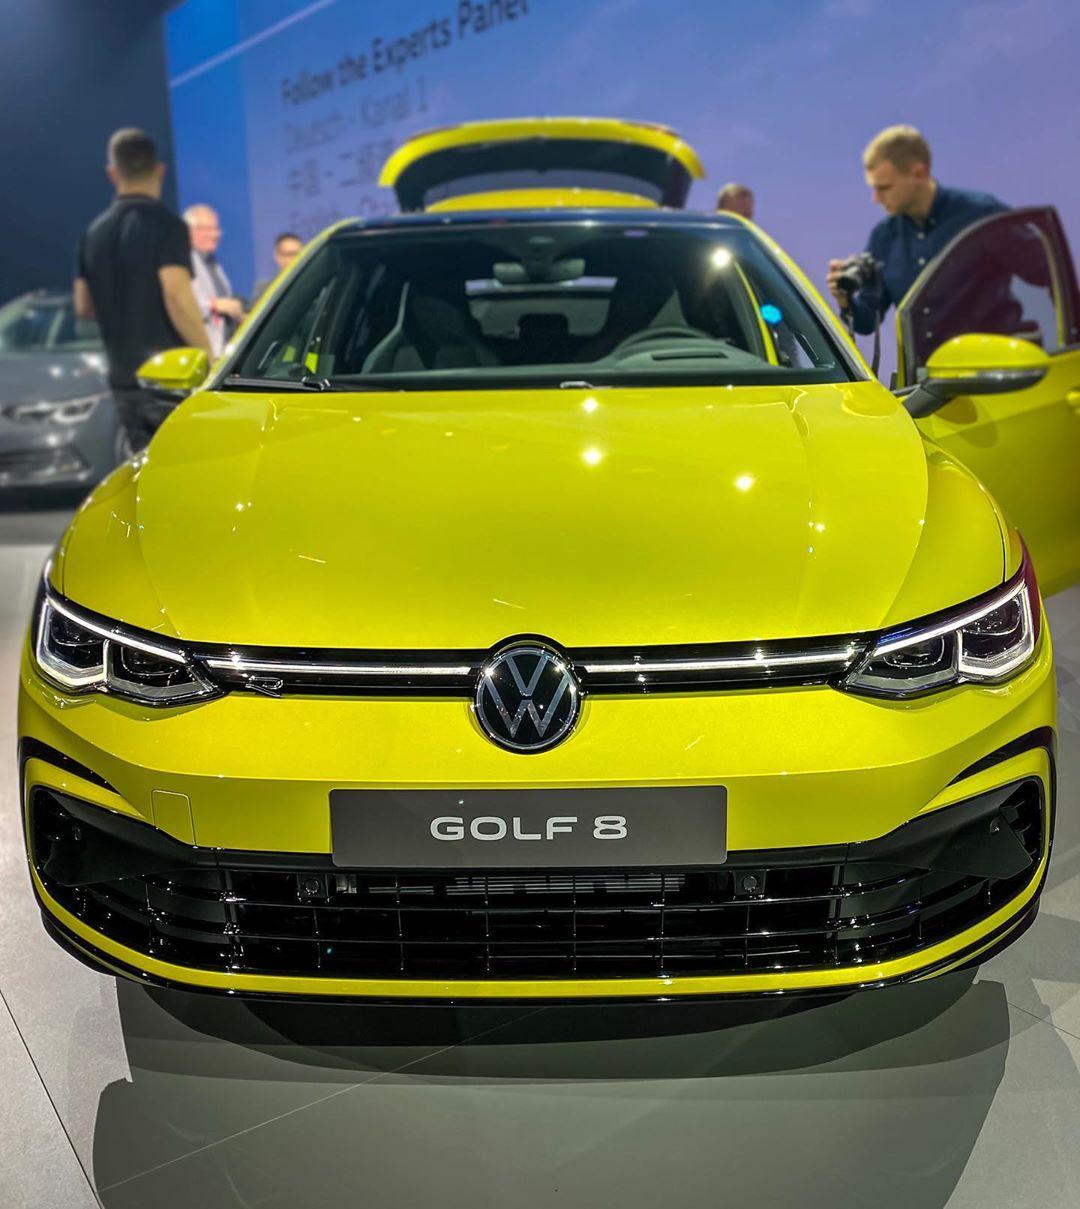 Wooww😱…new Golf 8 R-Line🔥🤩 #volkswagen #volkswagengolf8 #golf8 #golf8rline #newgolf #rline #automanntv